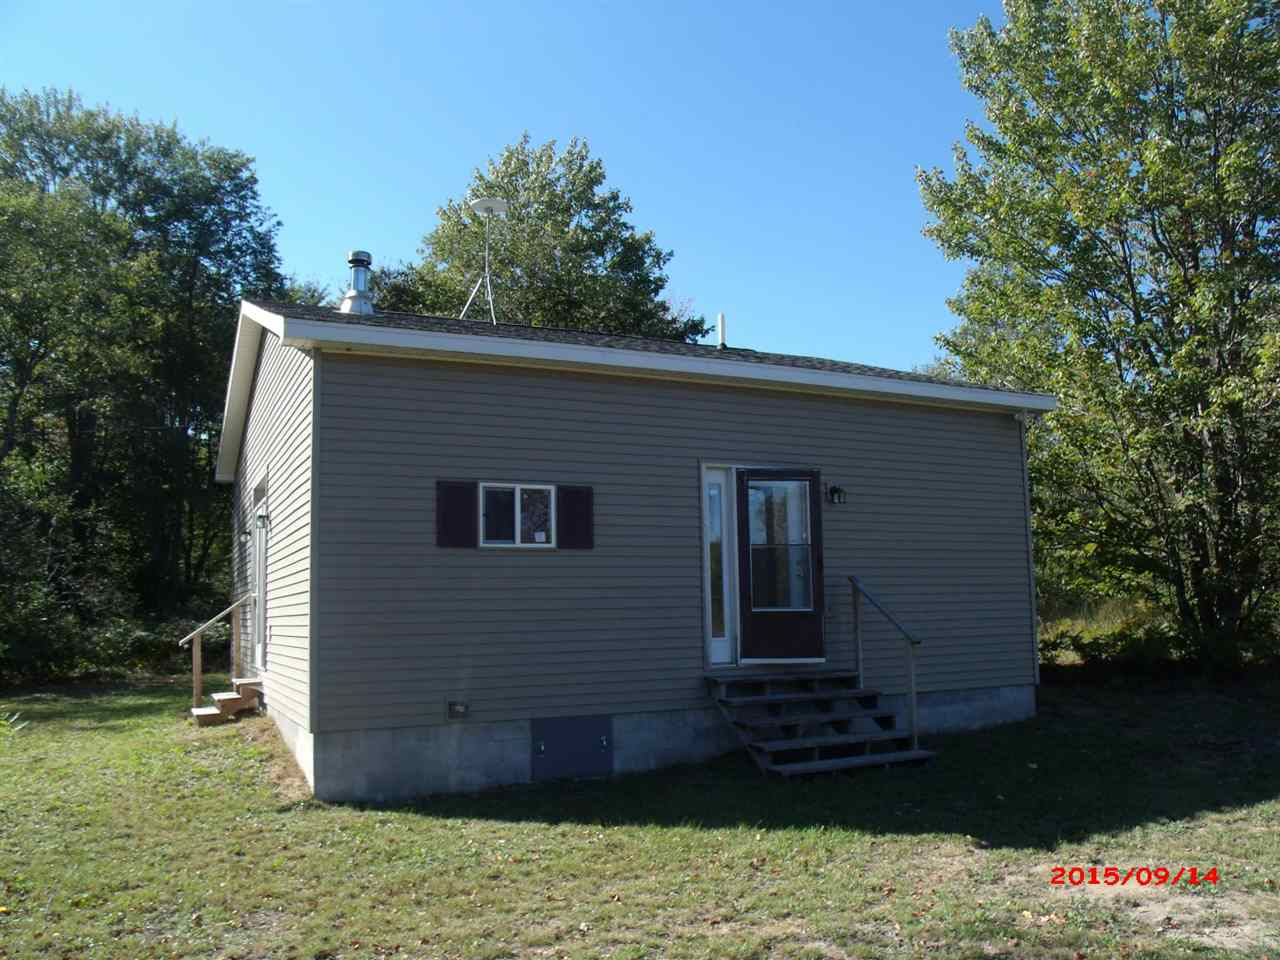 Real Estate for Sale, ListingId: 35548746, Frederic,MI49733